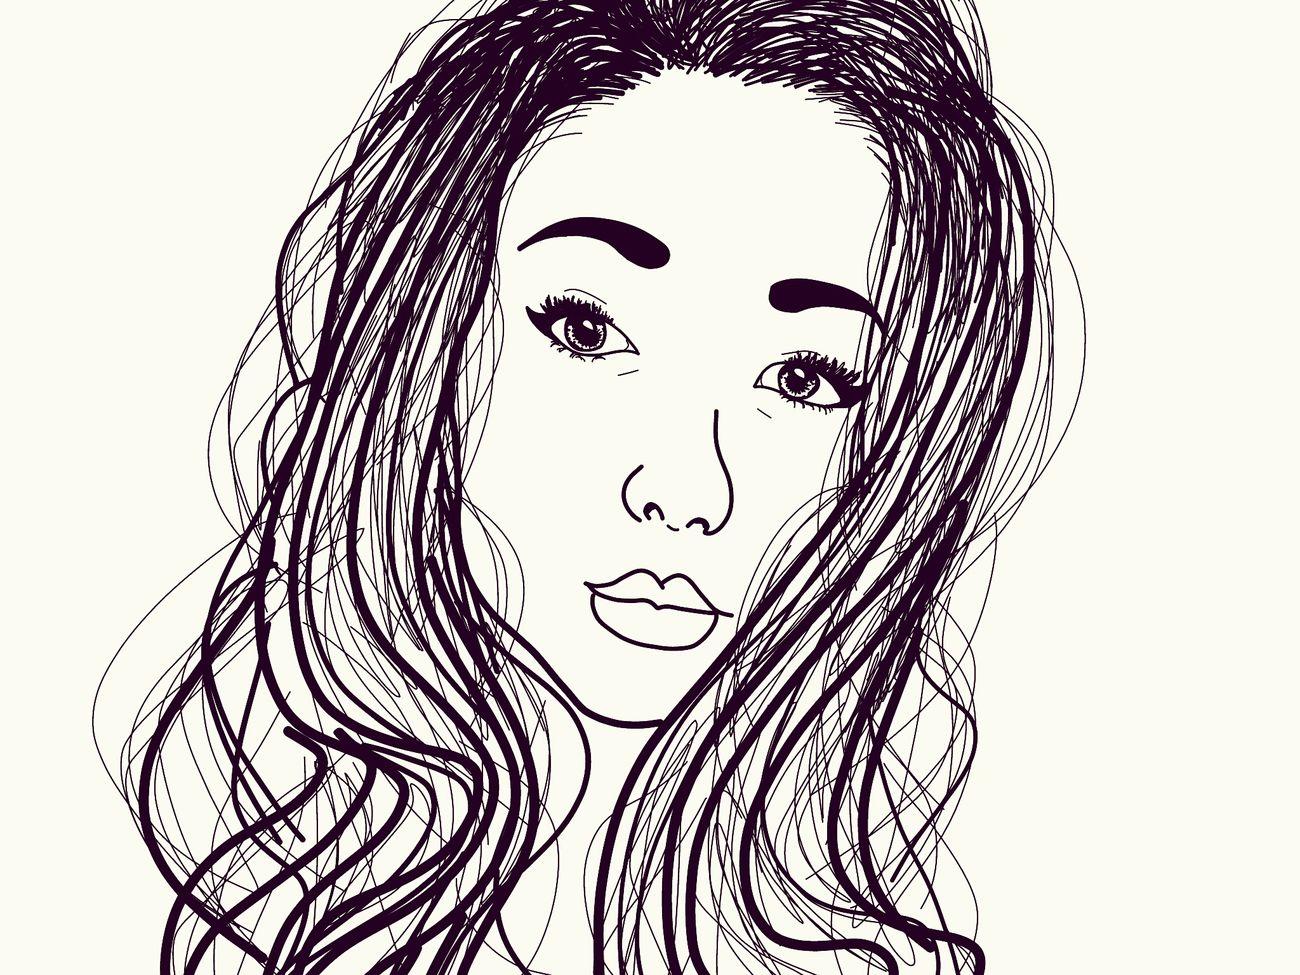 Tumblroutline Selfıe People Art Draw Cartoon Longhair Girl Creative One Person